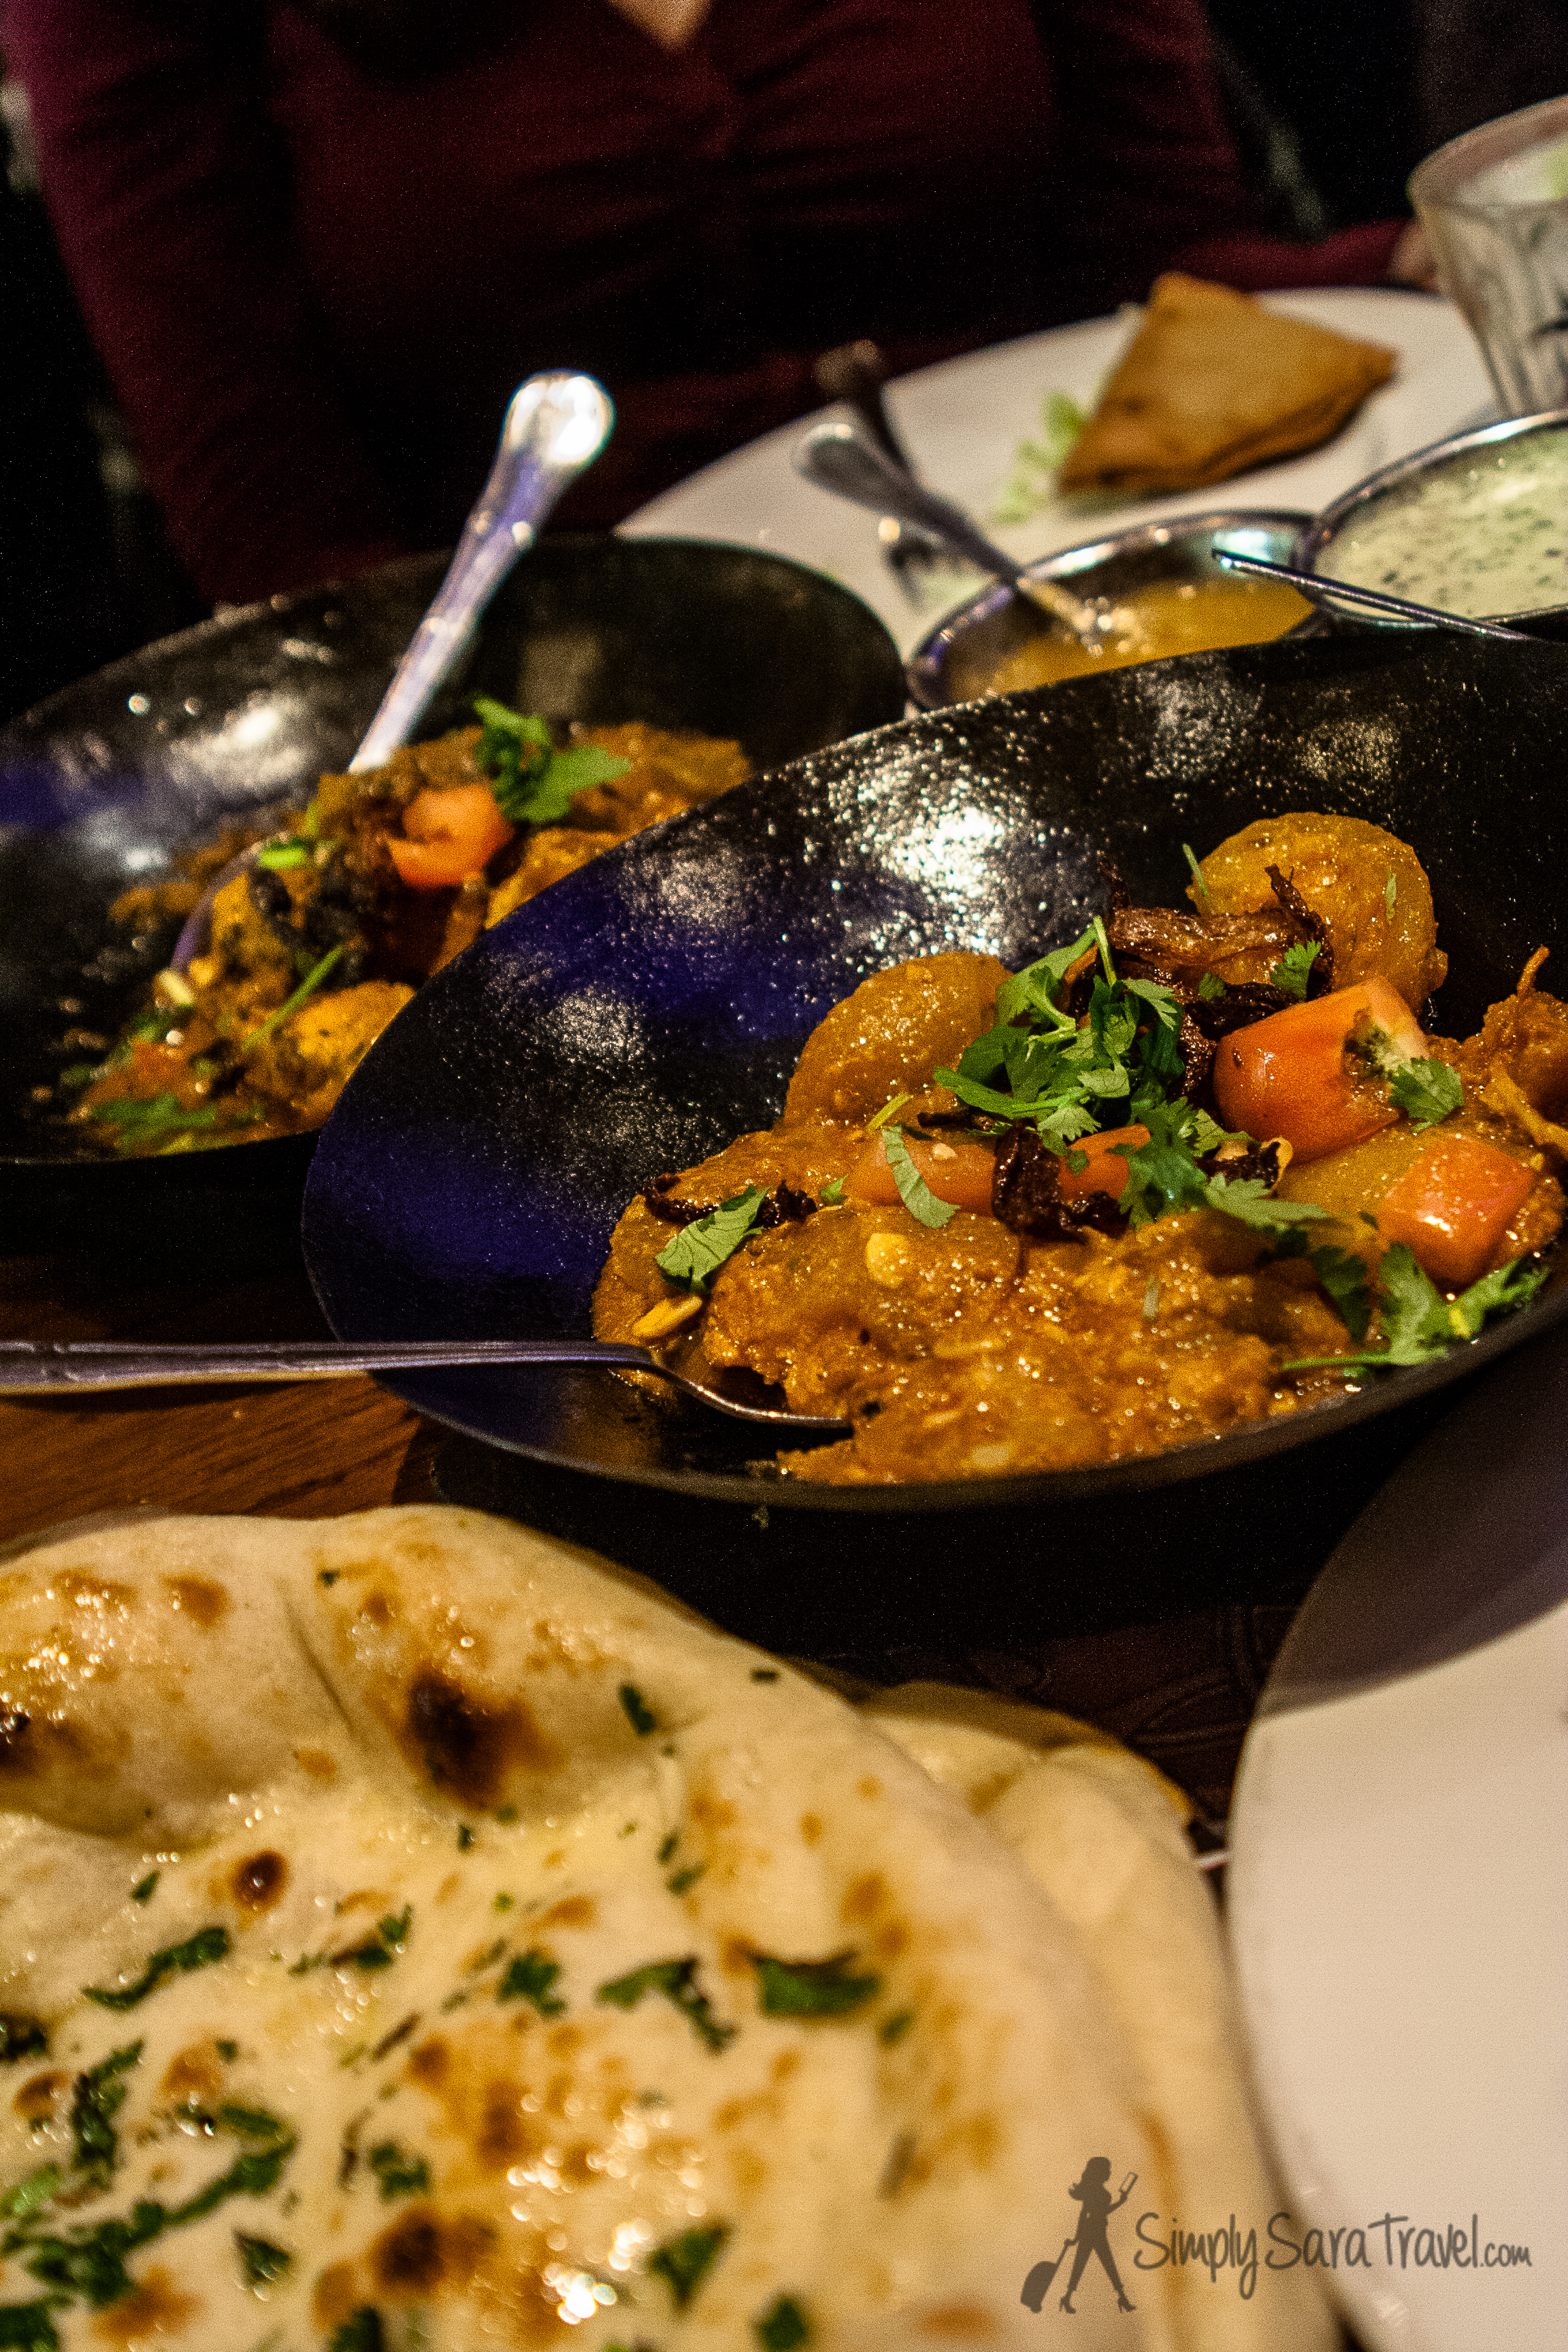 ChickenTikka Masala and Tinda Masala (pumpkin dish) alongside some of the best naan I've eaten